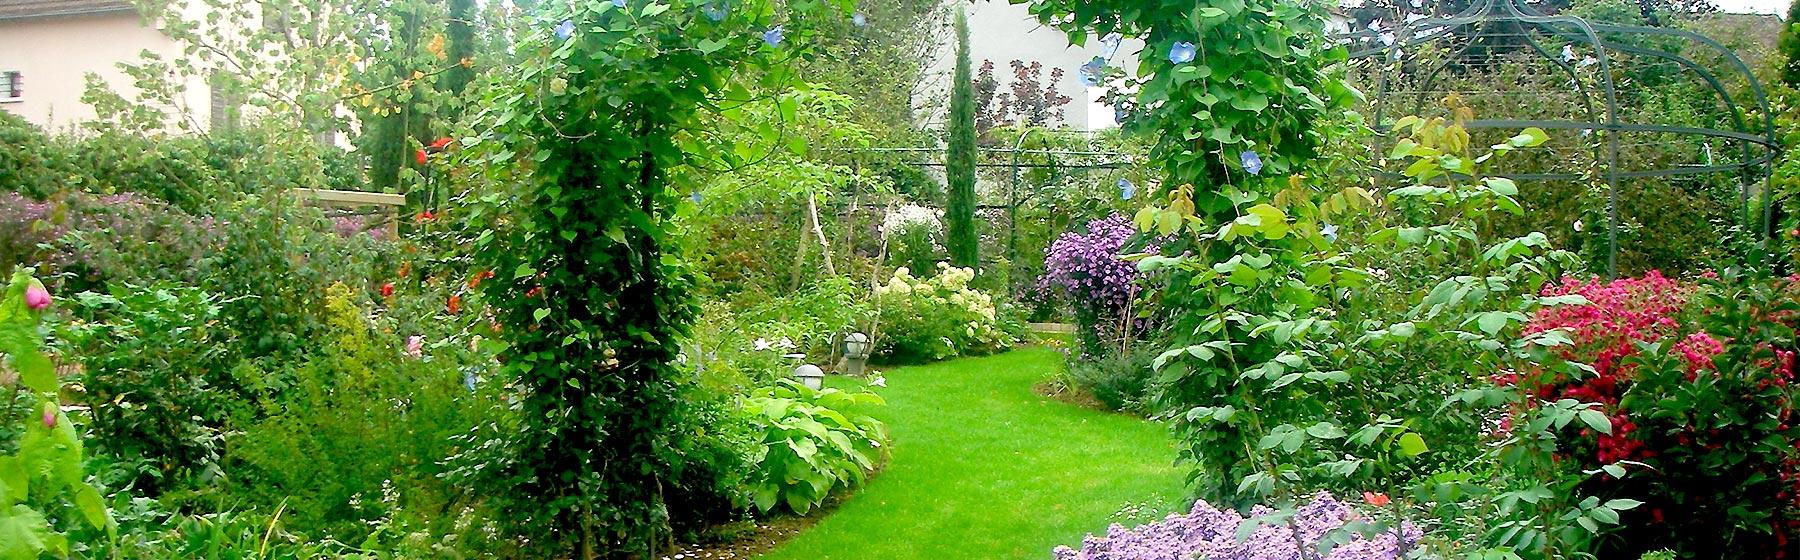 Jardin profusion de plantes